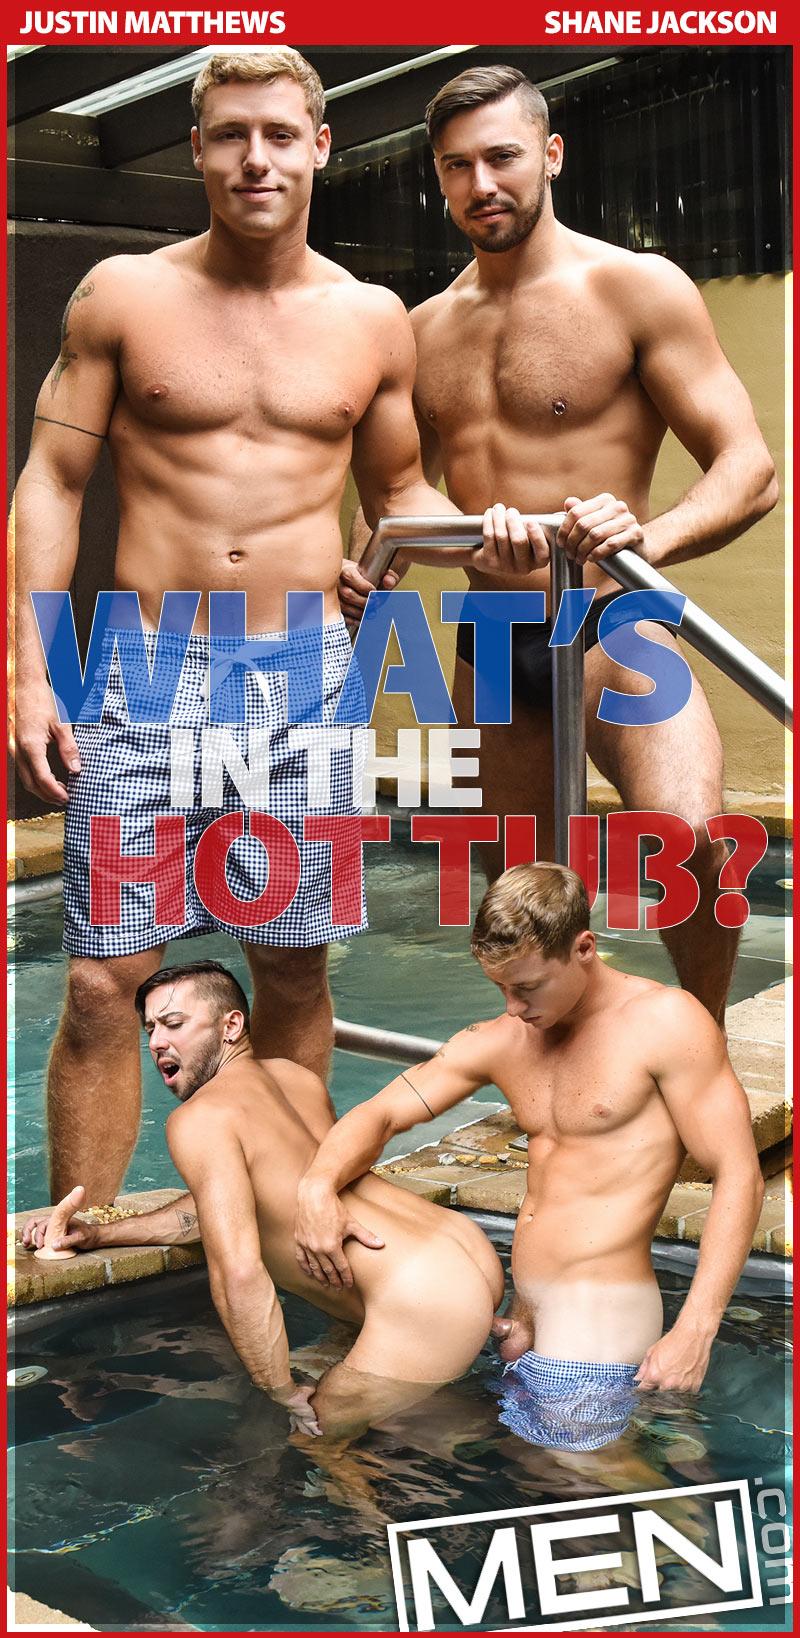 What's in the Hot Tub? (Justin Matthews Fucks Shane Jackson) at Str8 To Gay